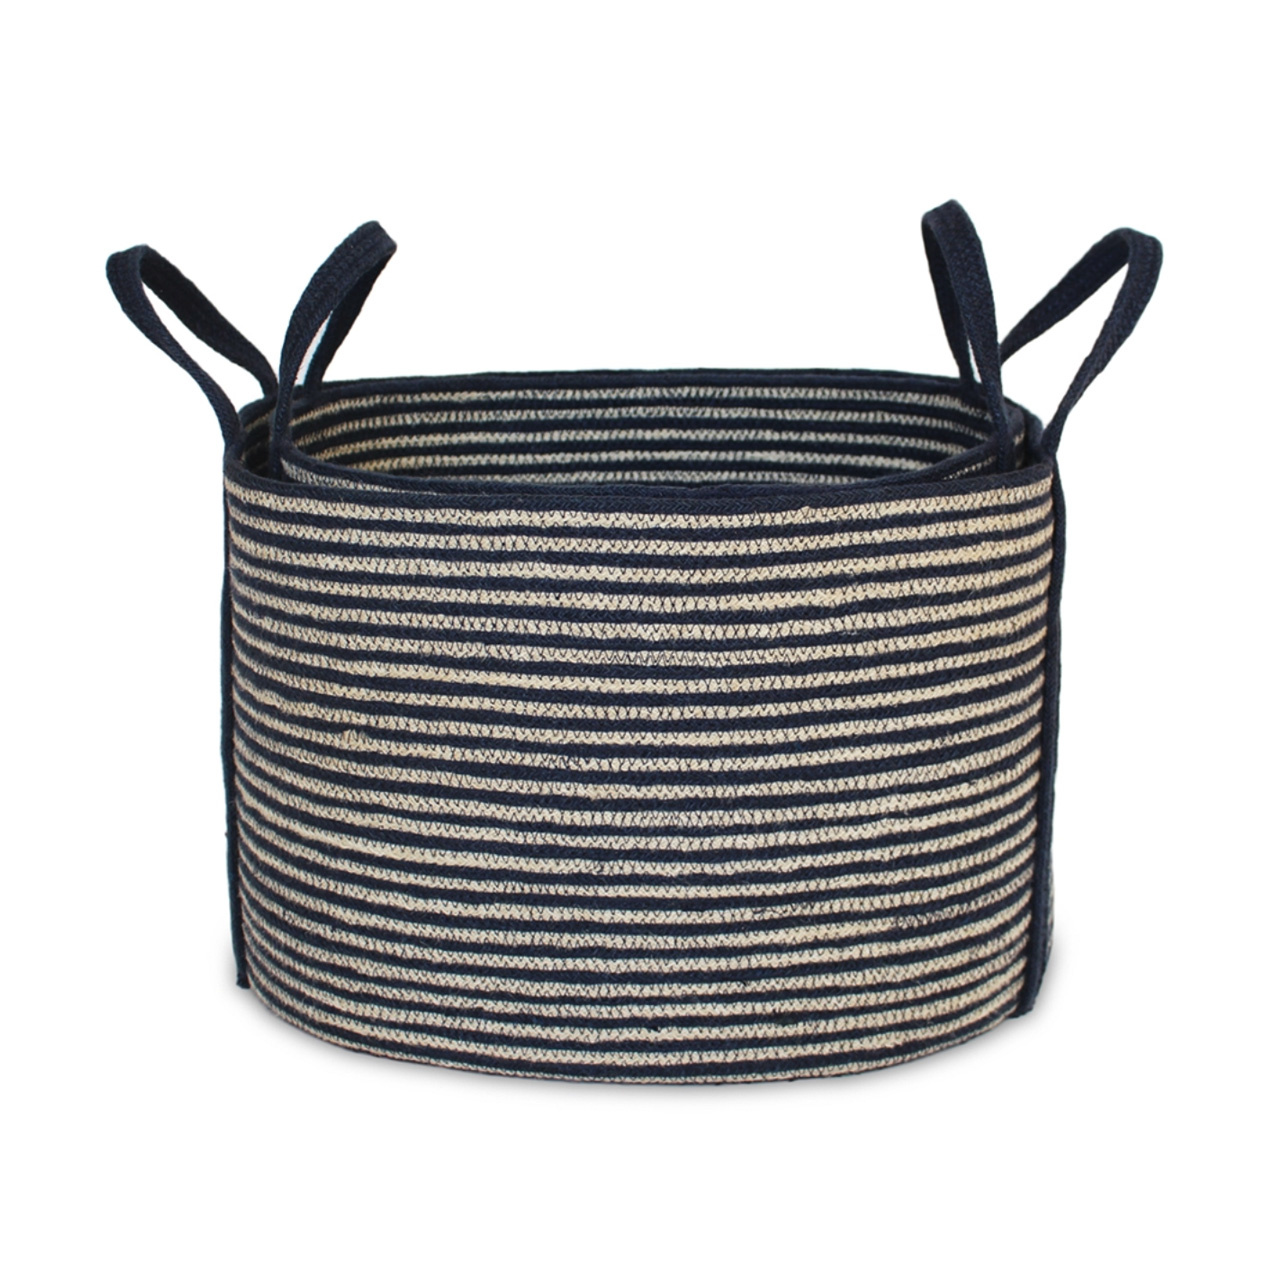 Jute Oval Tote Laundry Basket - Large-2